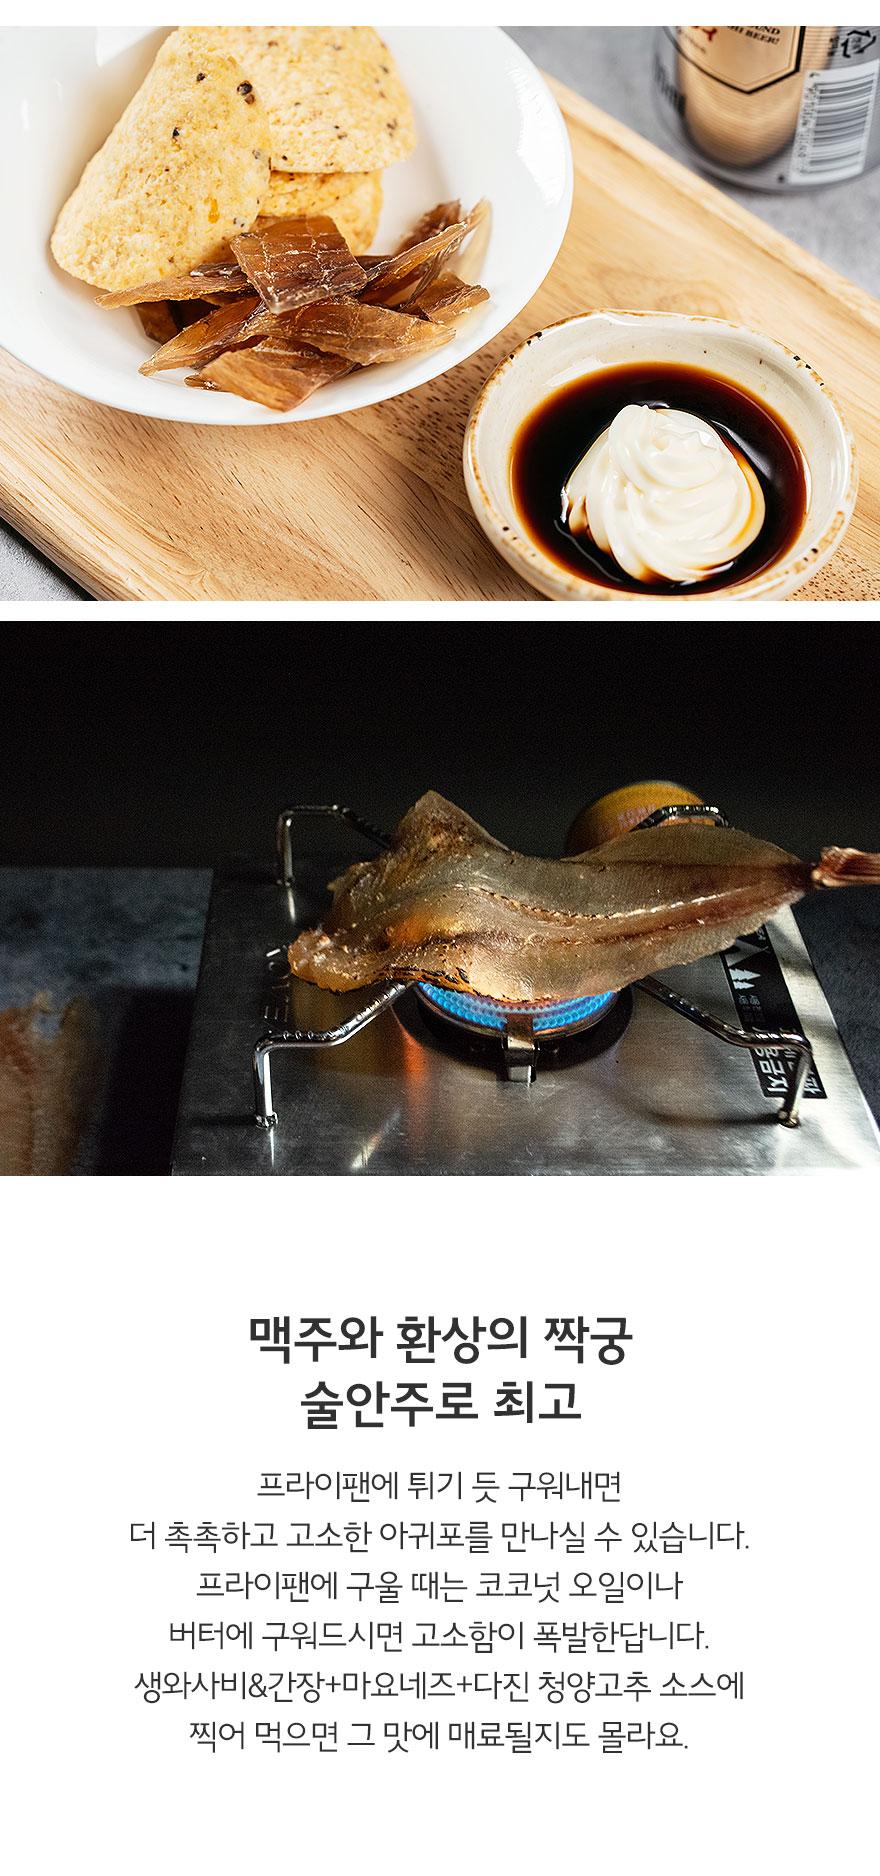 bdb003(국내산)_04.jpg